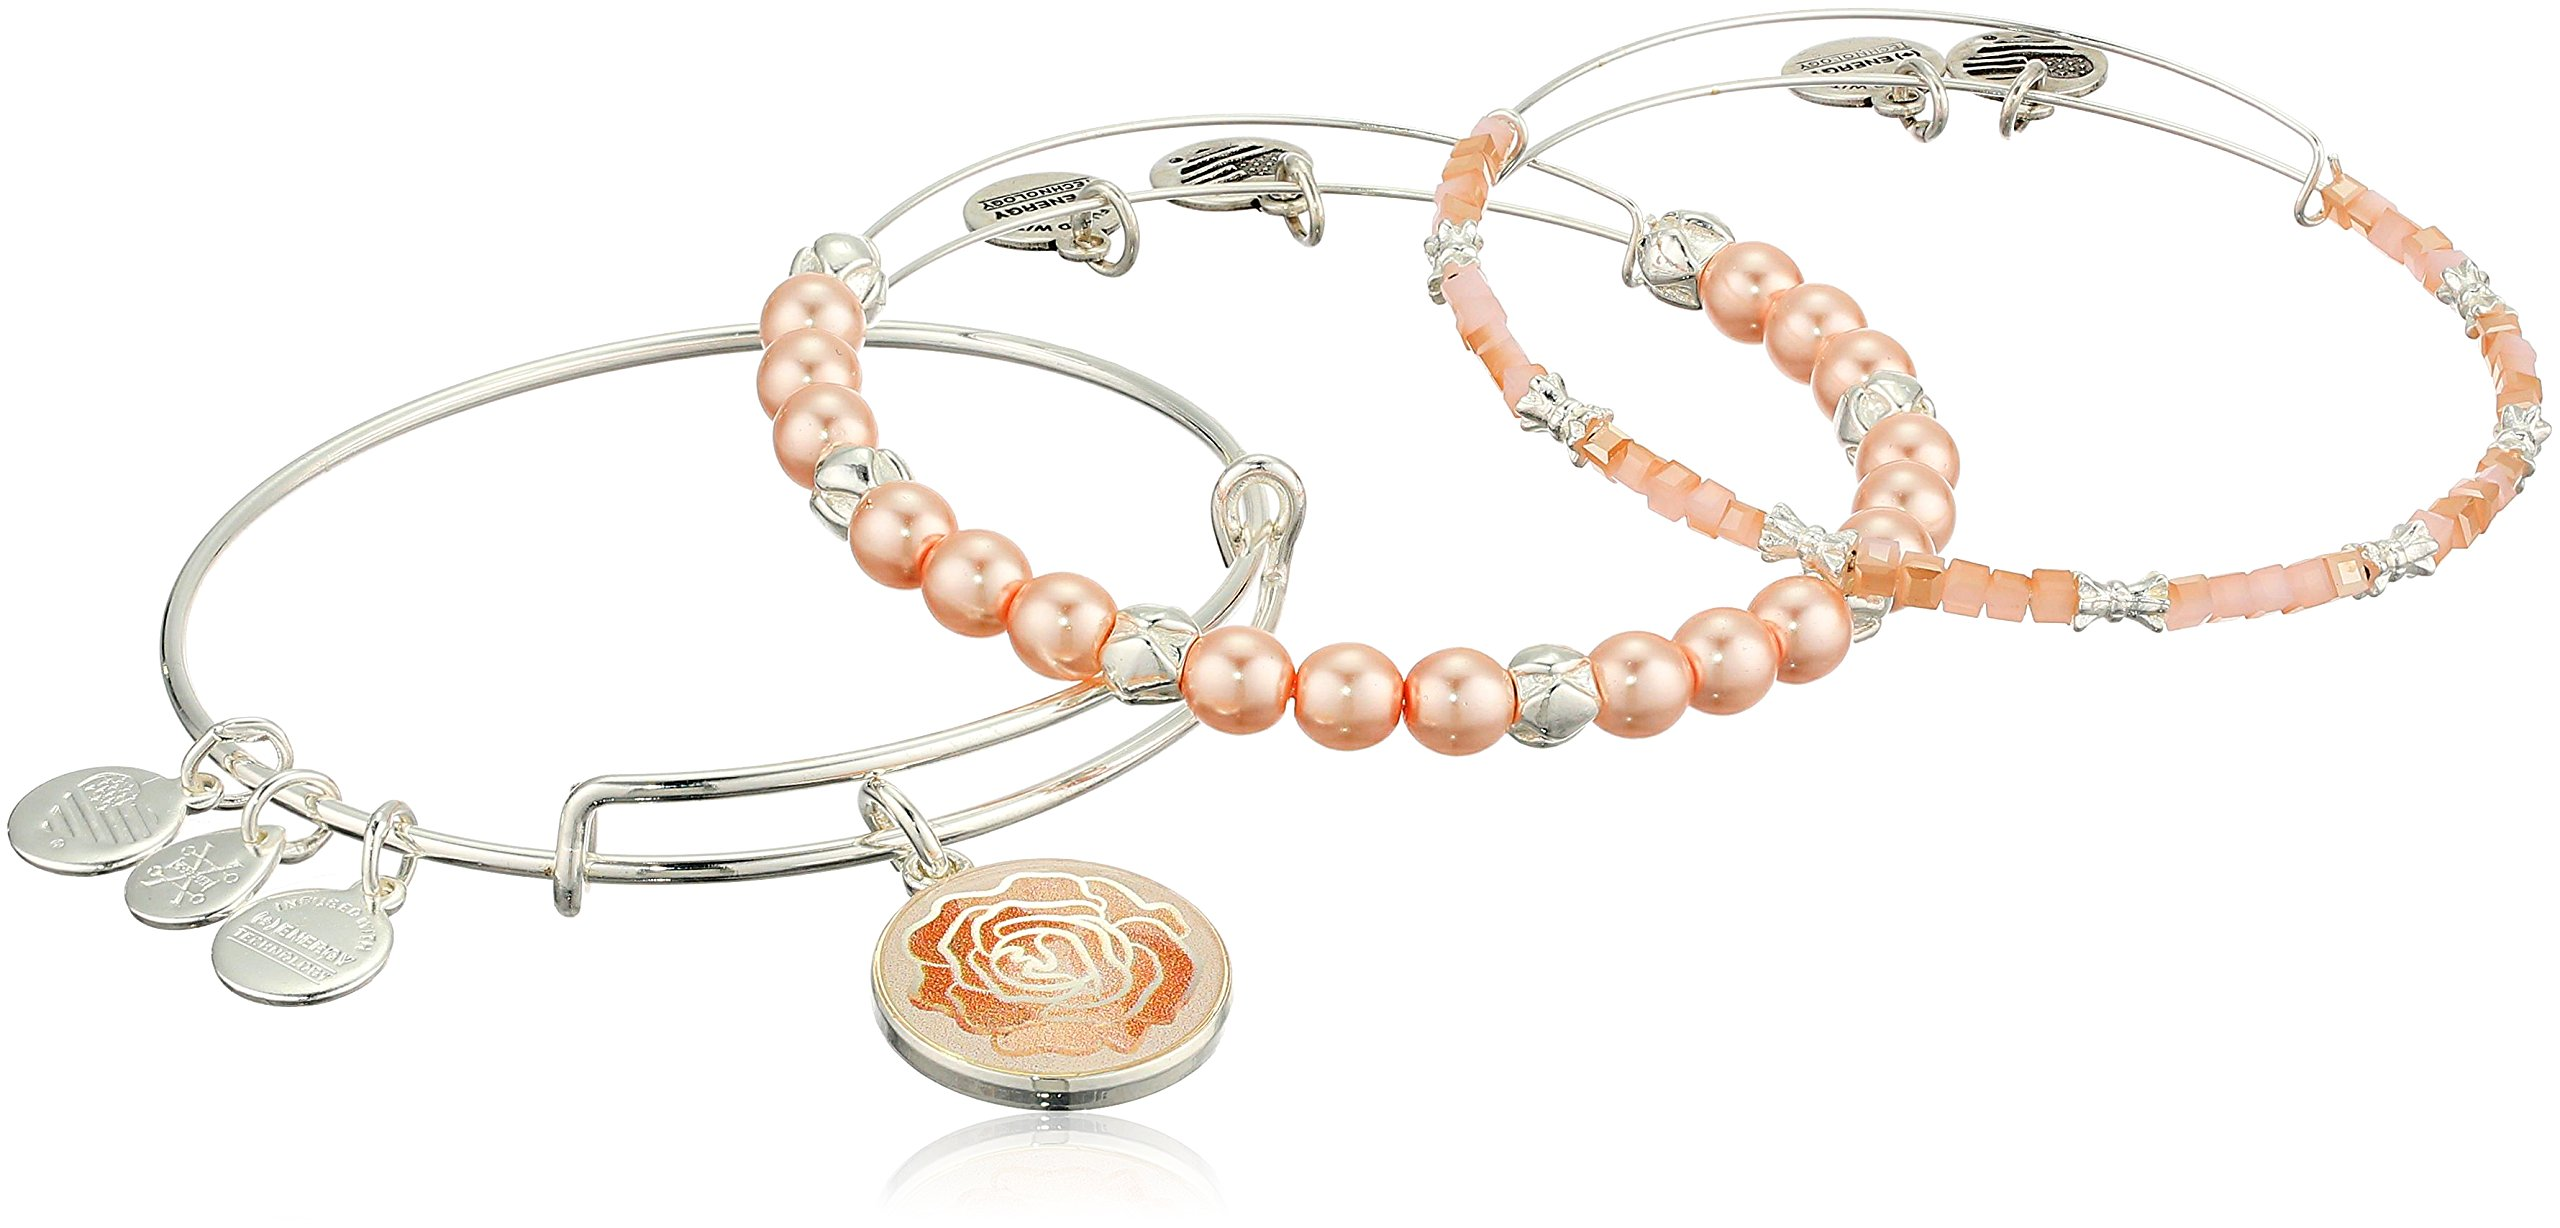 Alex and Ani Women's Art Infusion, Rose Set of 3 Bangle Bracelet, Shiny Silver, Expandable